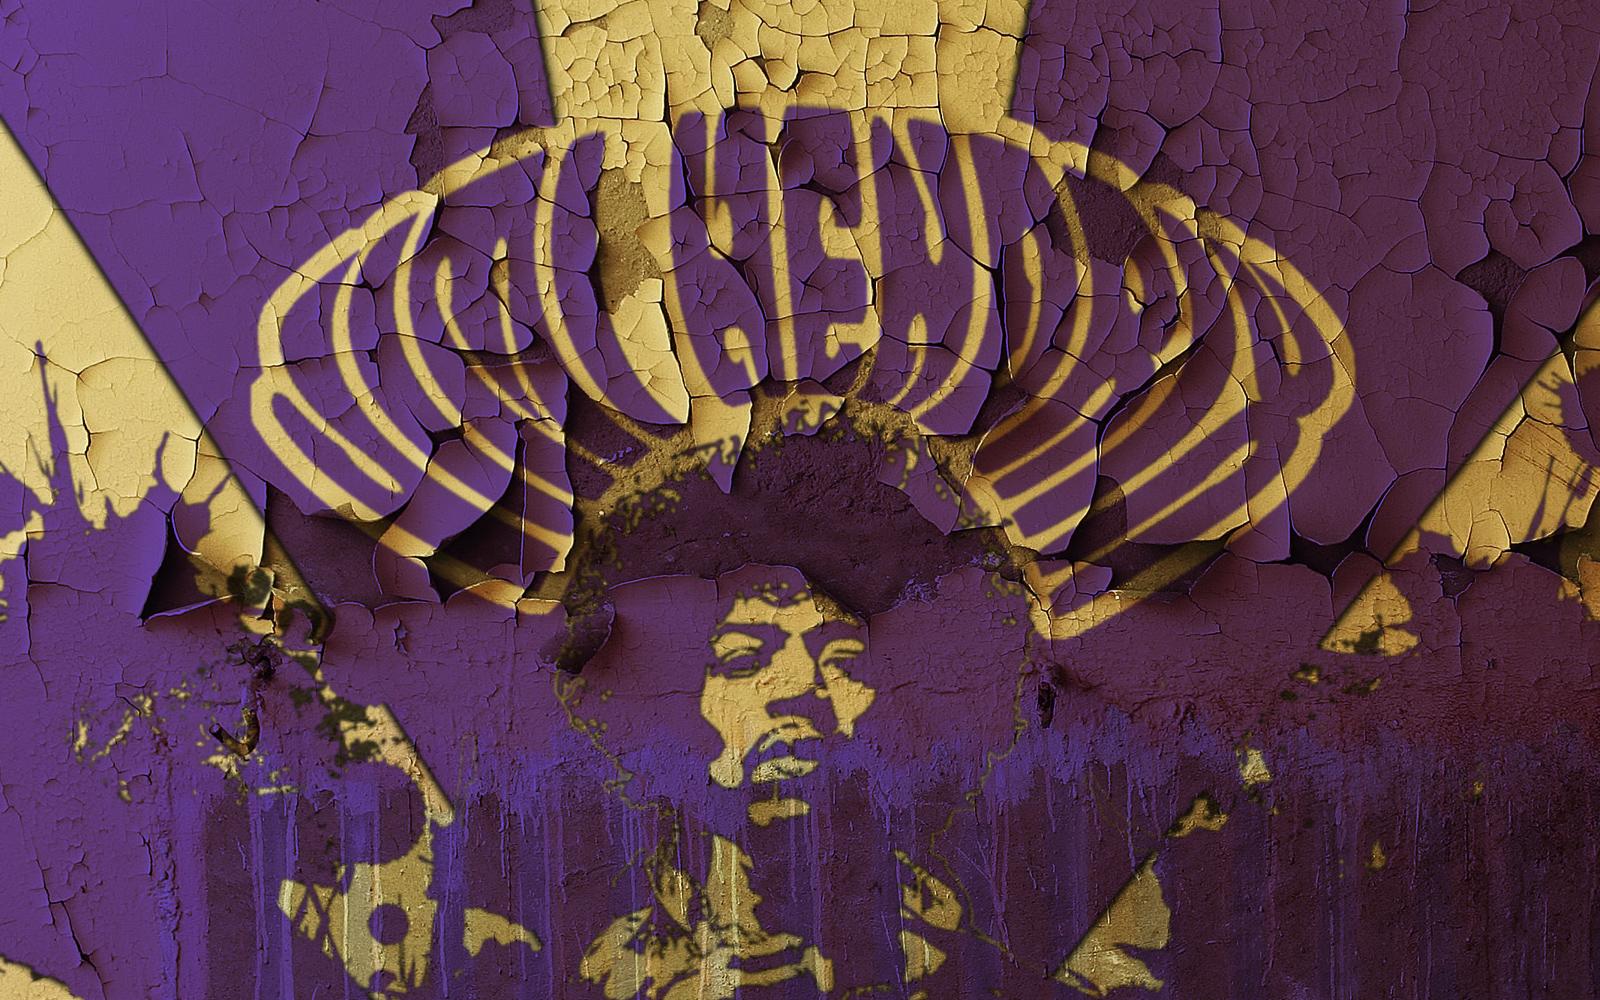 jimi hendrix 2 wallpaper - photo #6